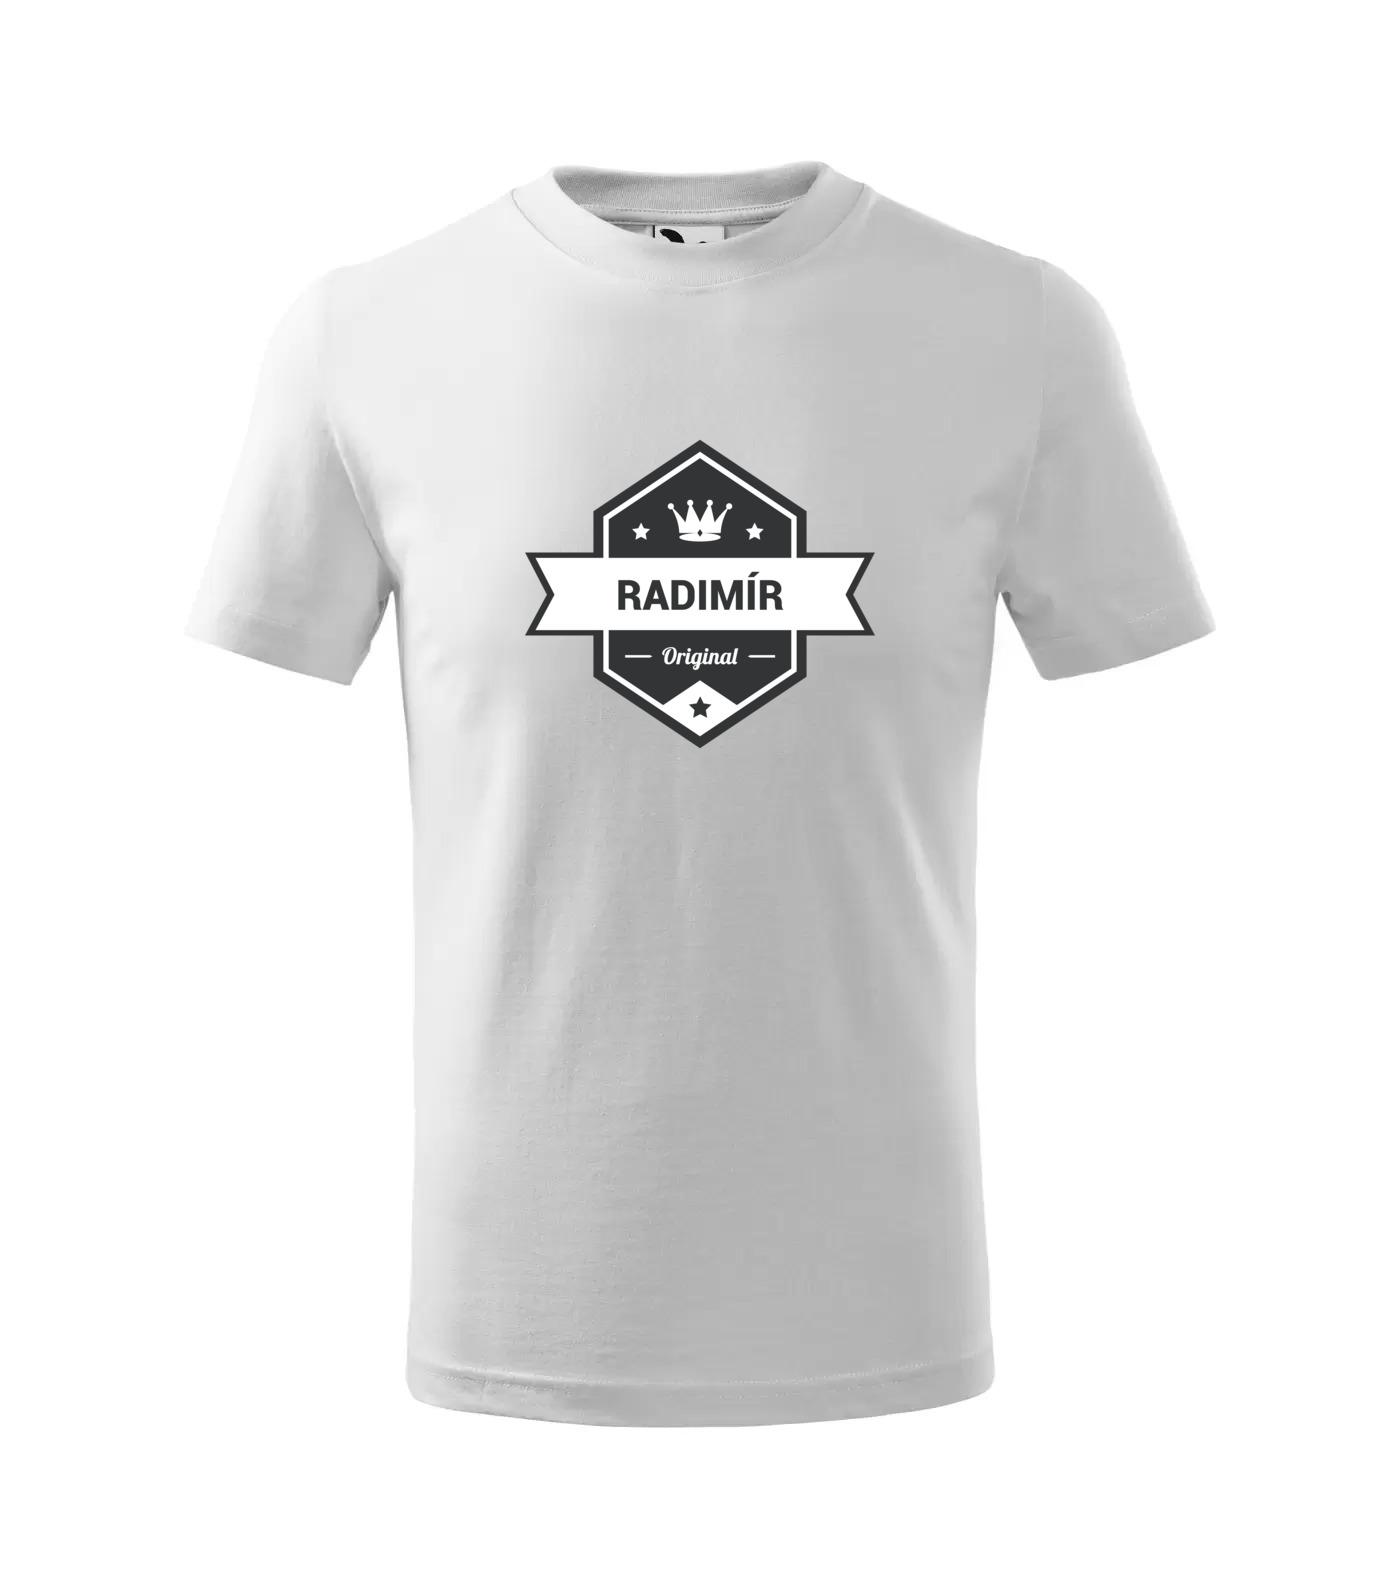 Tričko King Radimír